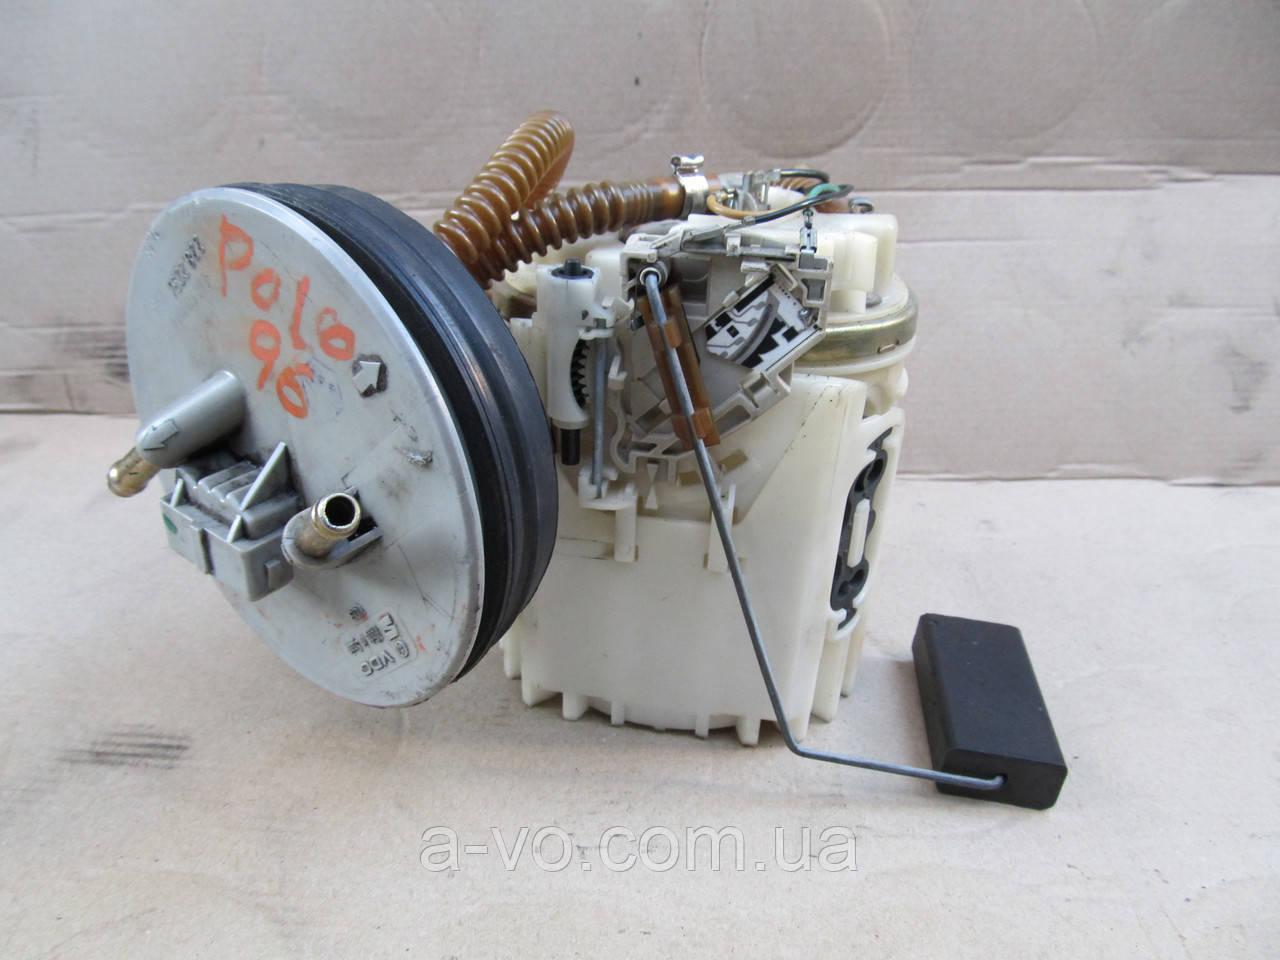 Бензонасос насос топливный для VW Polo 3 6N Seat Ibiza Cordoba 1.4, 6N0919051K